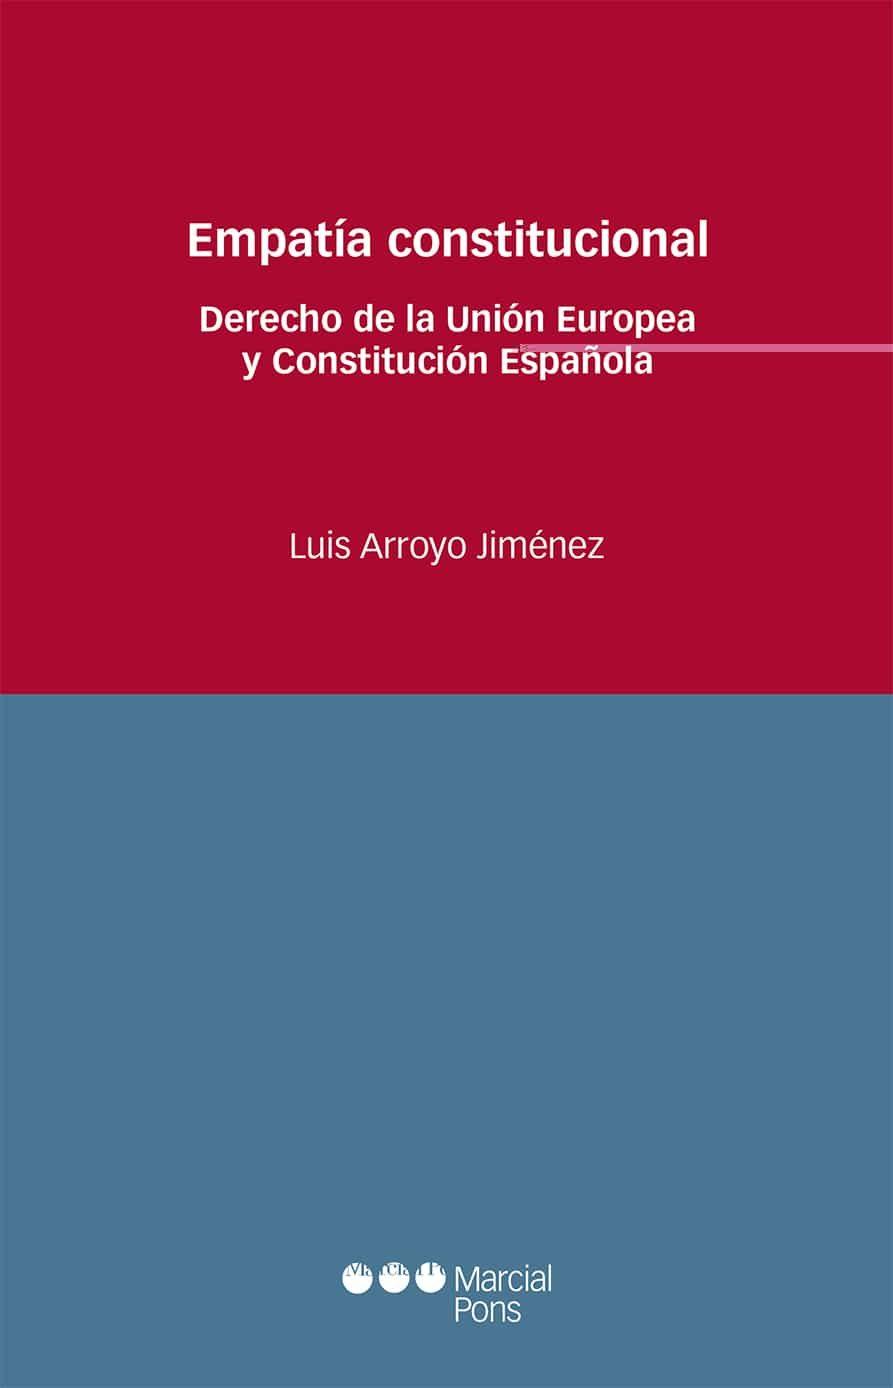 Empatia Constitucional por Luis Arroyo Jimenez